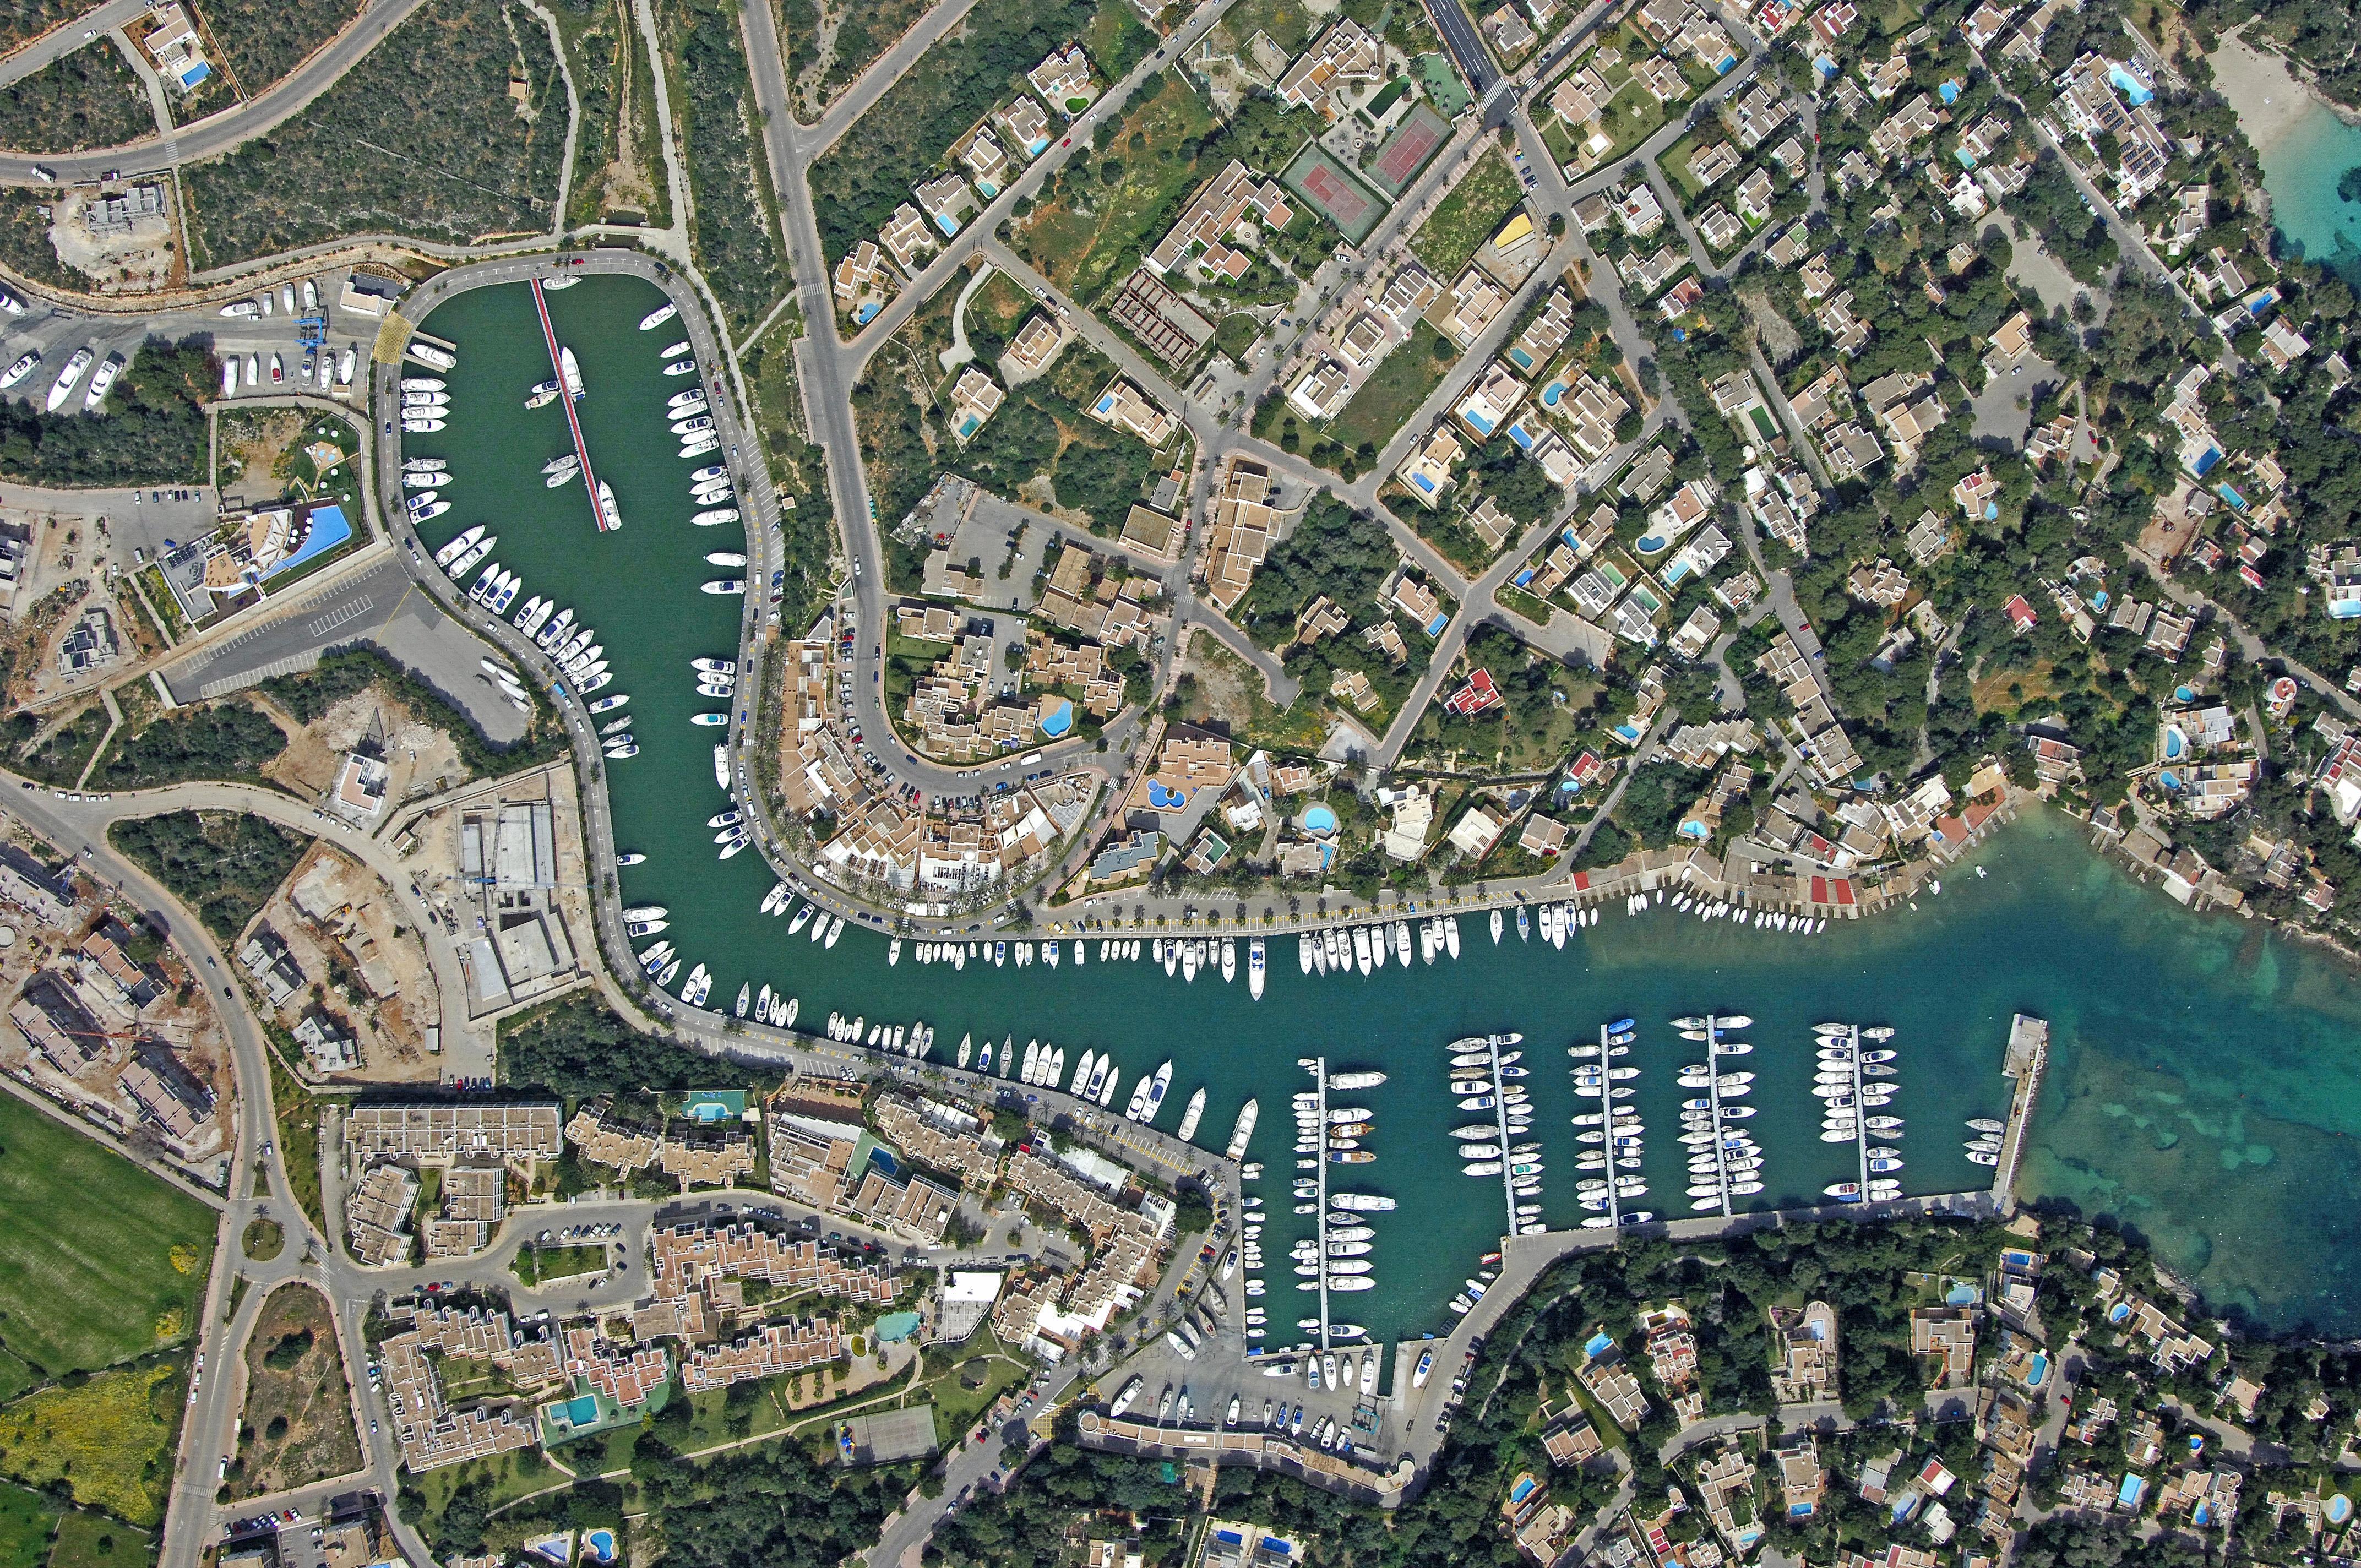 Cala DOr Marina in Cala DOr Mallorca Spain Marina Reviews